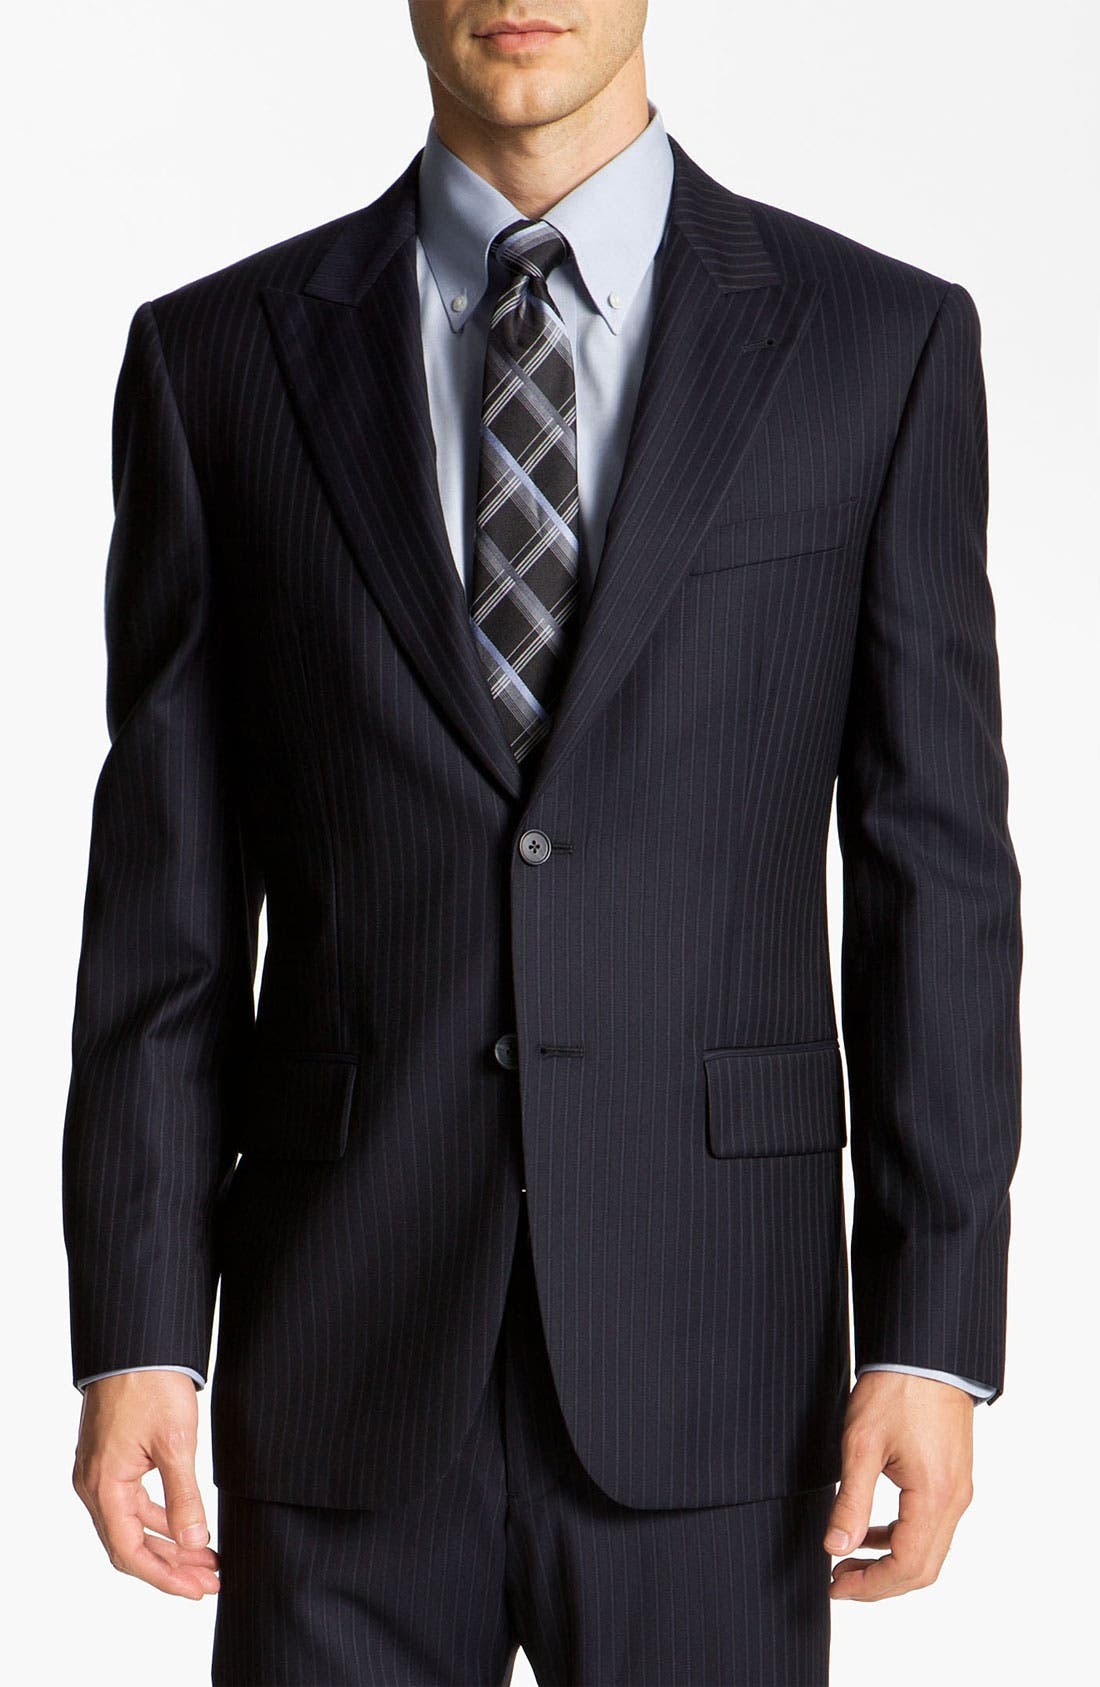 Alternate Image 1 Selected - Joseph Abboud 'Profile' Pinstripe Wool Suit